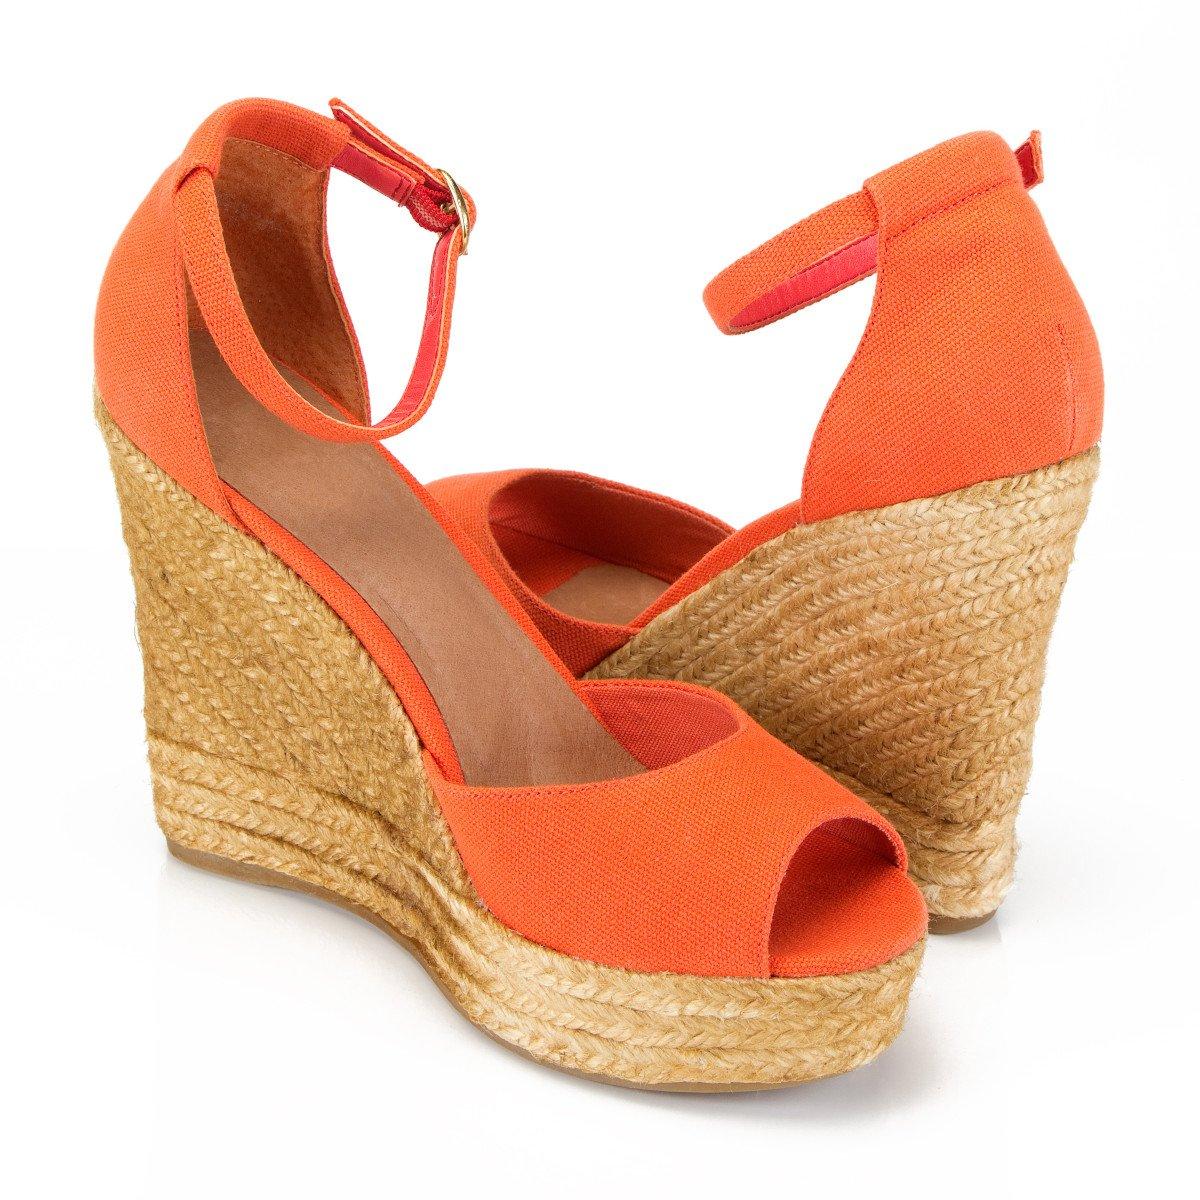 orange espadrille wedge sandals